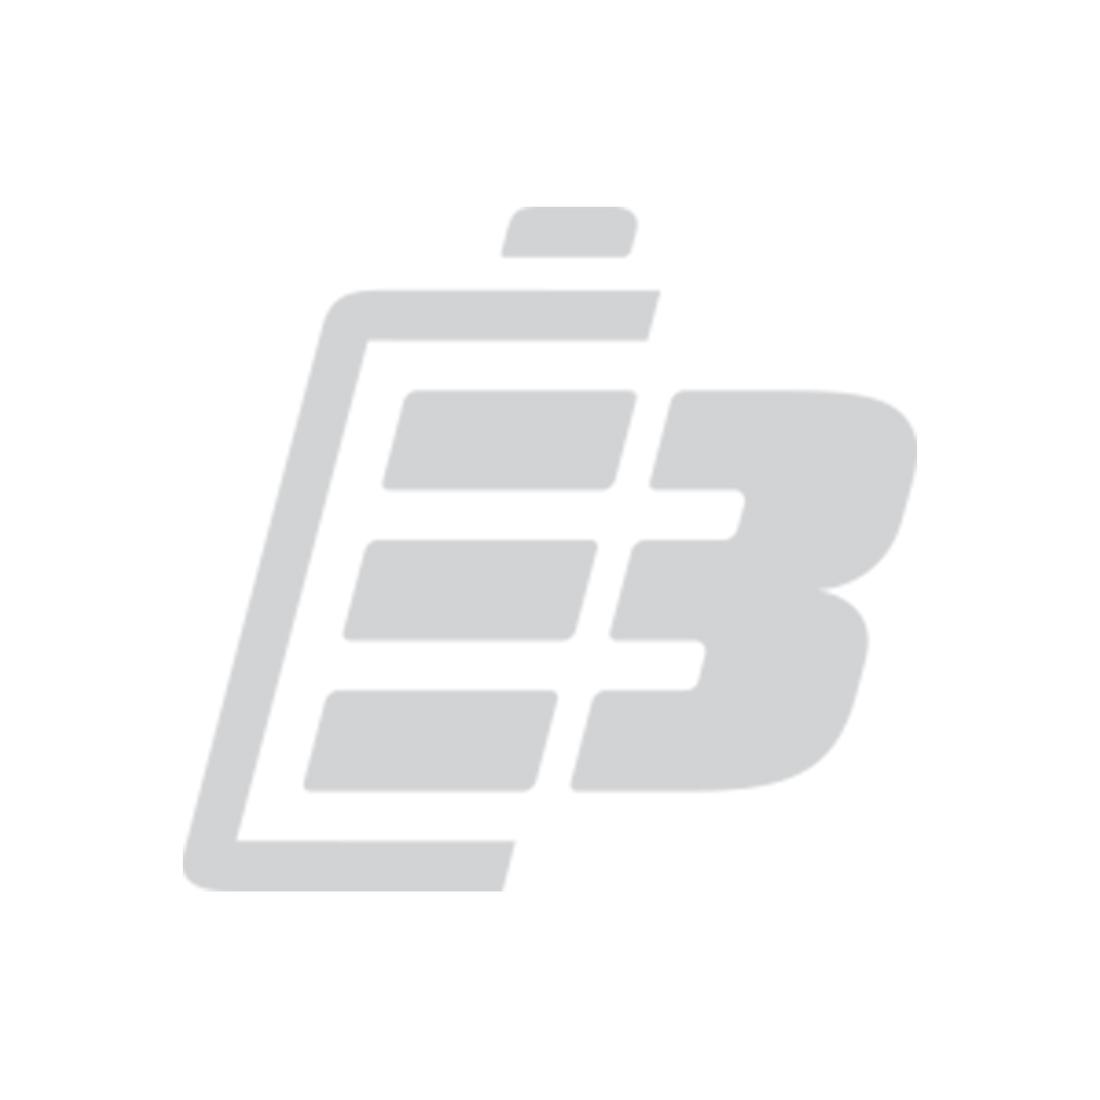 Laptop battery Asus X200ca_1